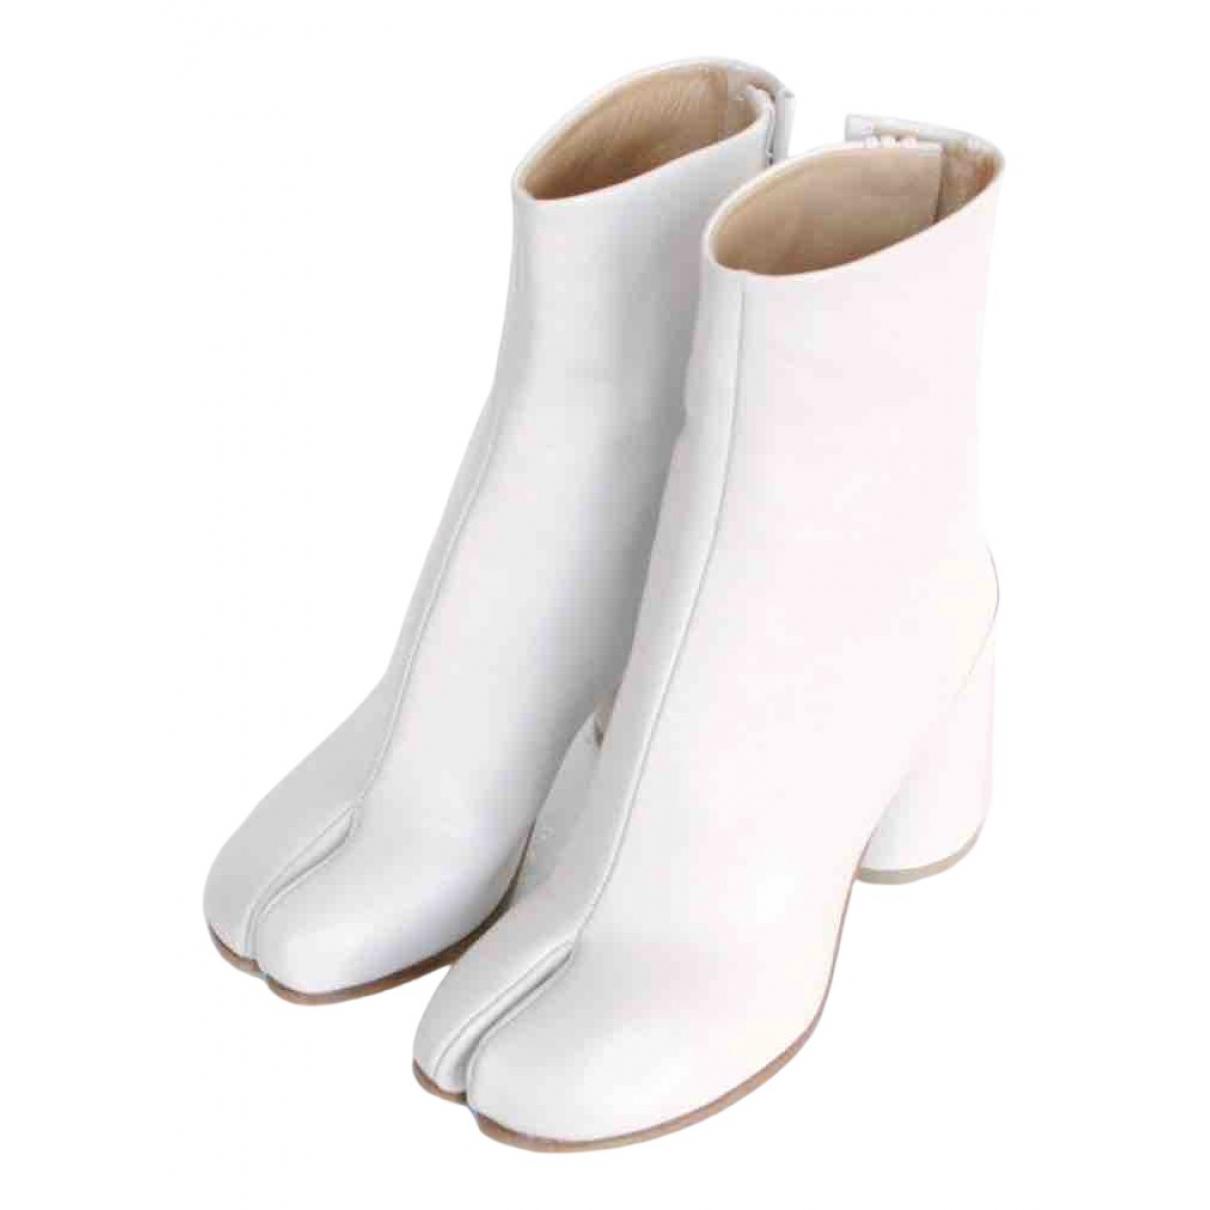 Maison Martin Margiela Tabi White Leather Ankle boots for Women 37 EU